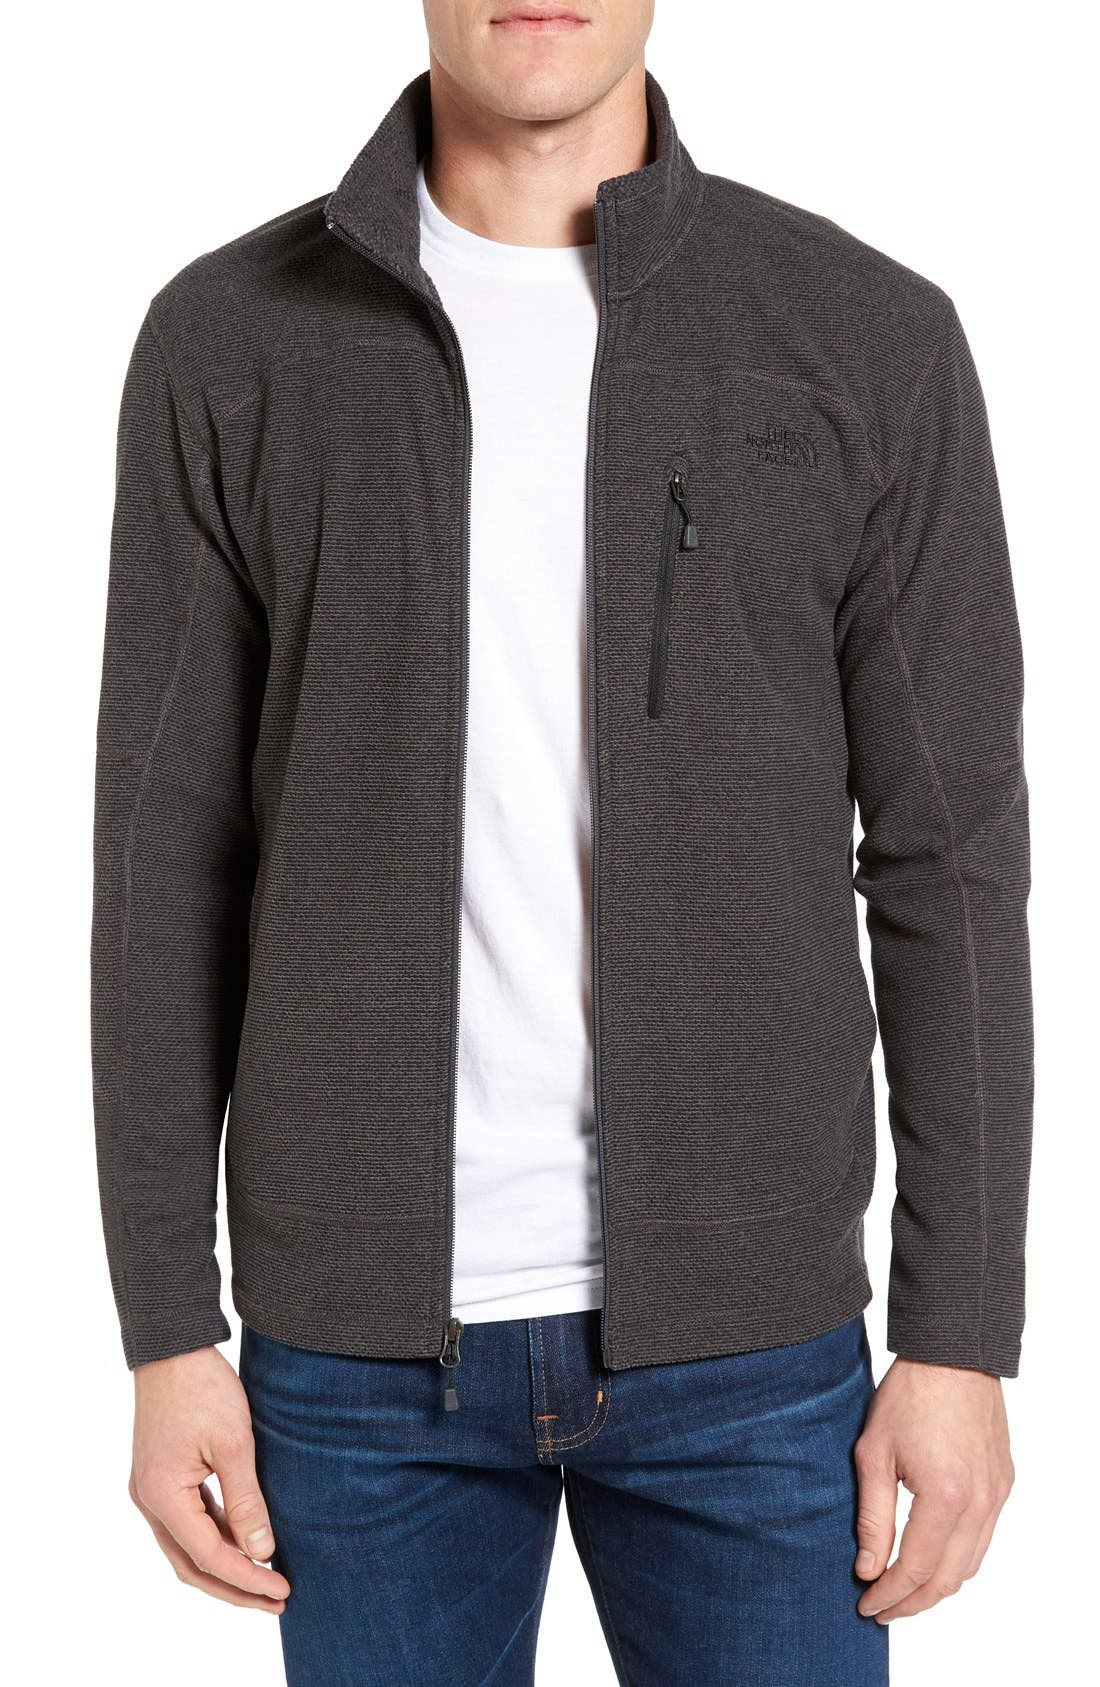 Main Image - The North Face 'Texture Cap Rock' Fleece Jacket